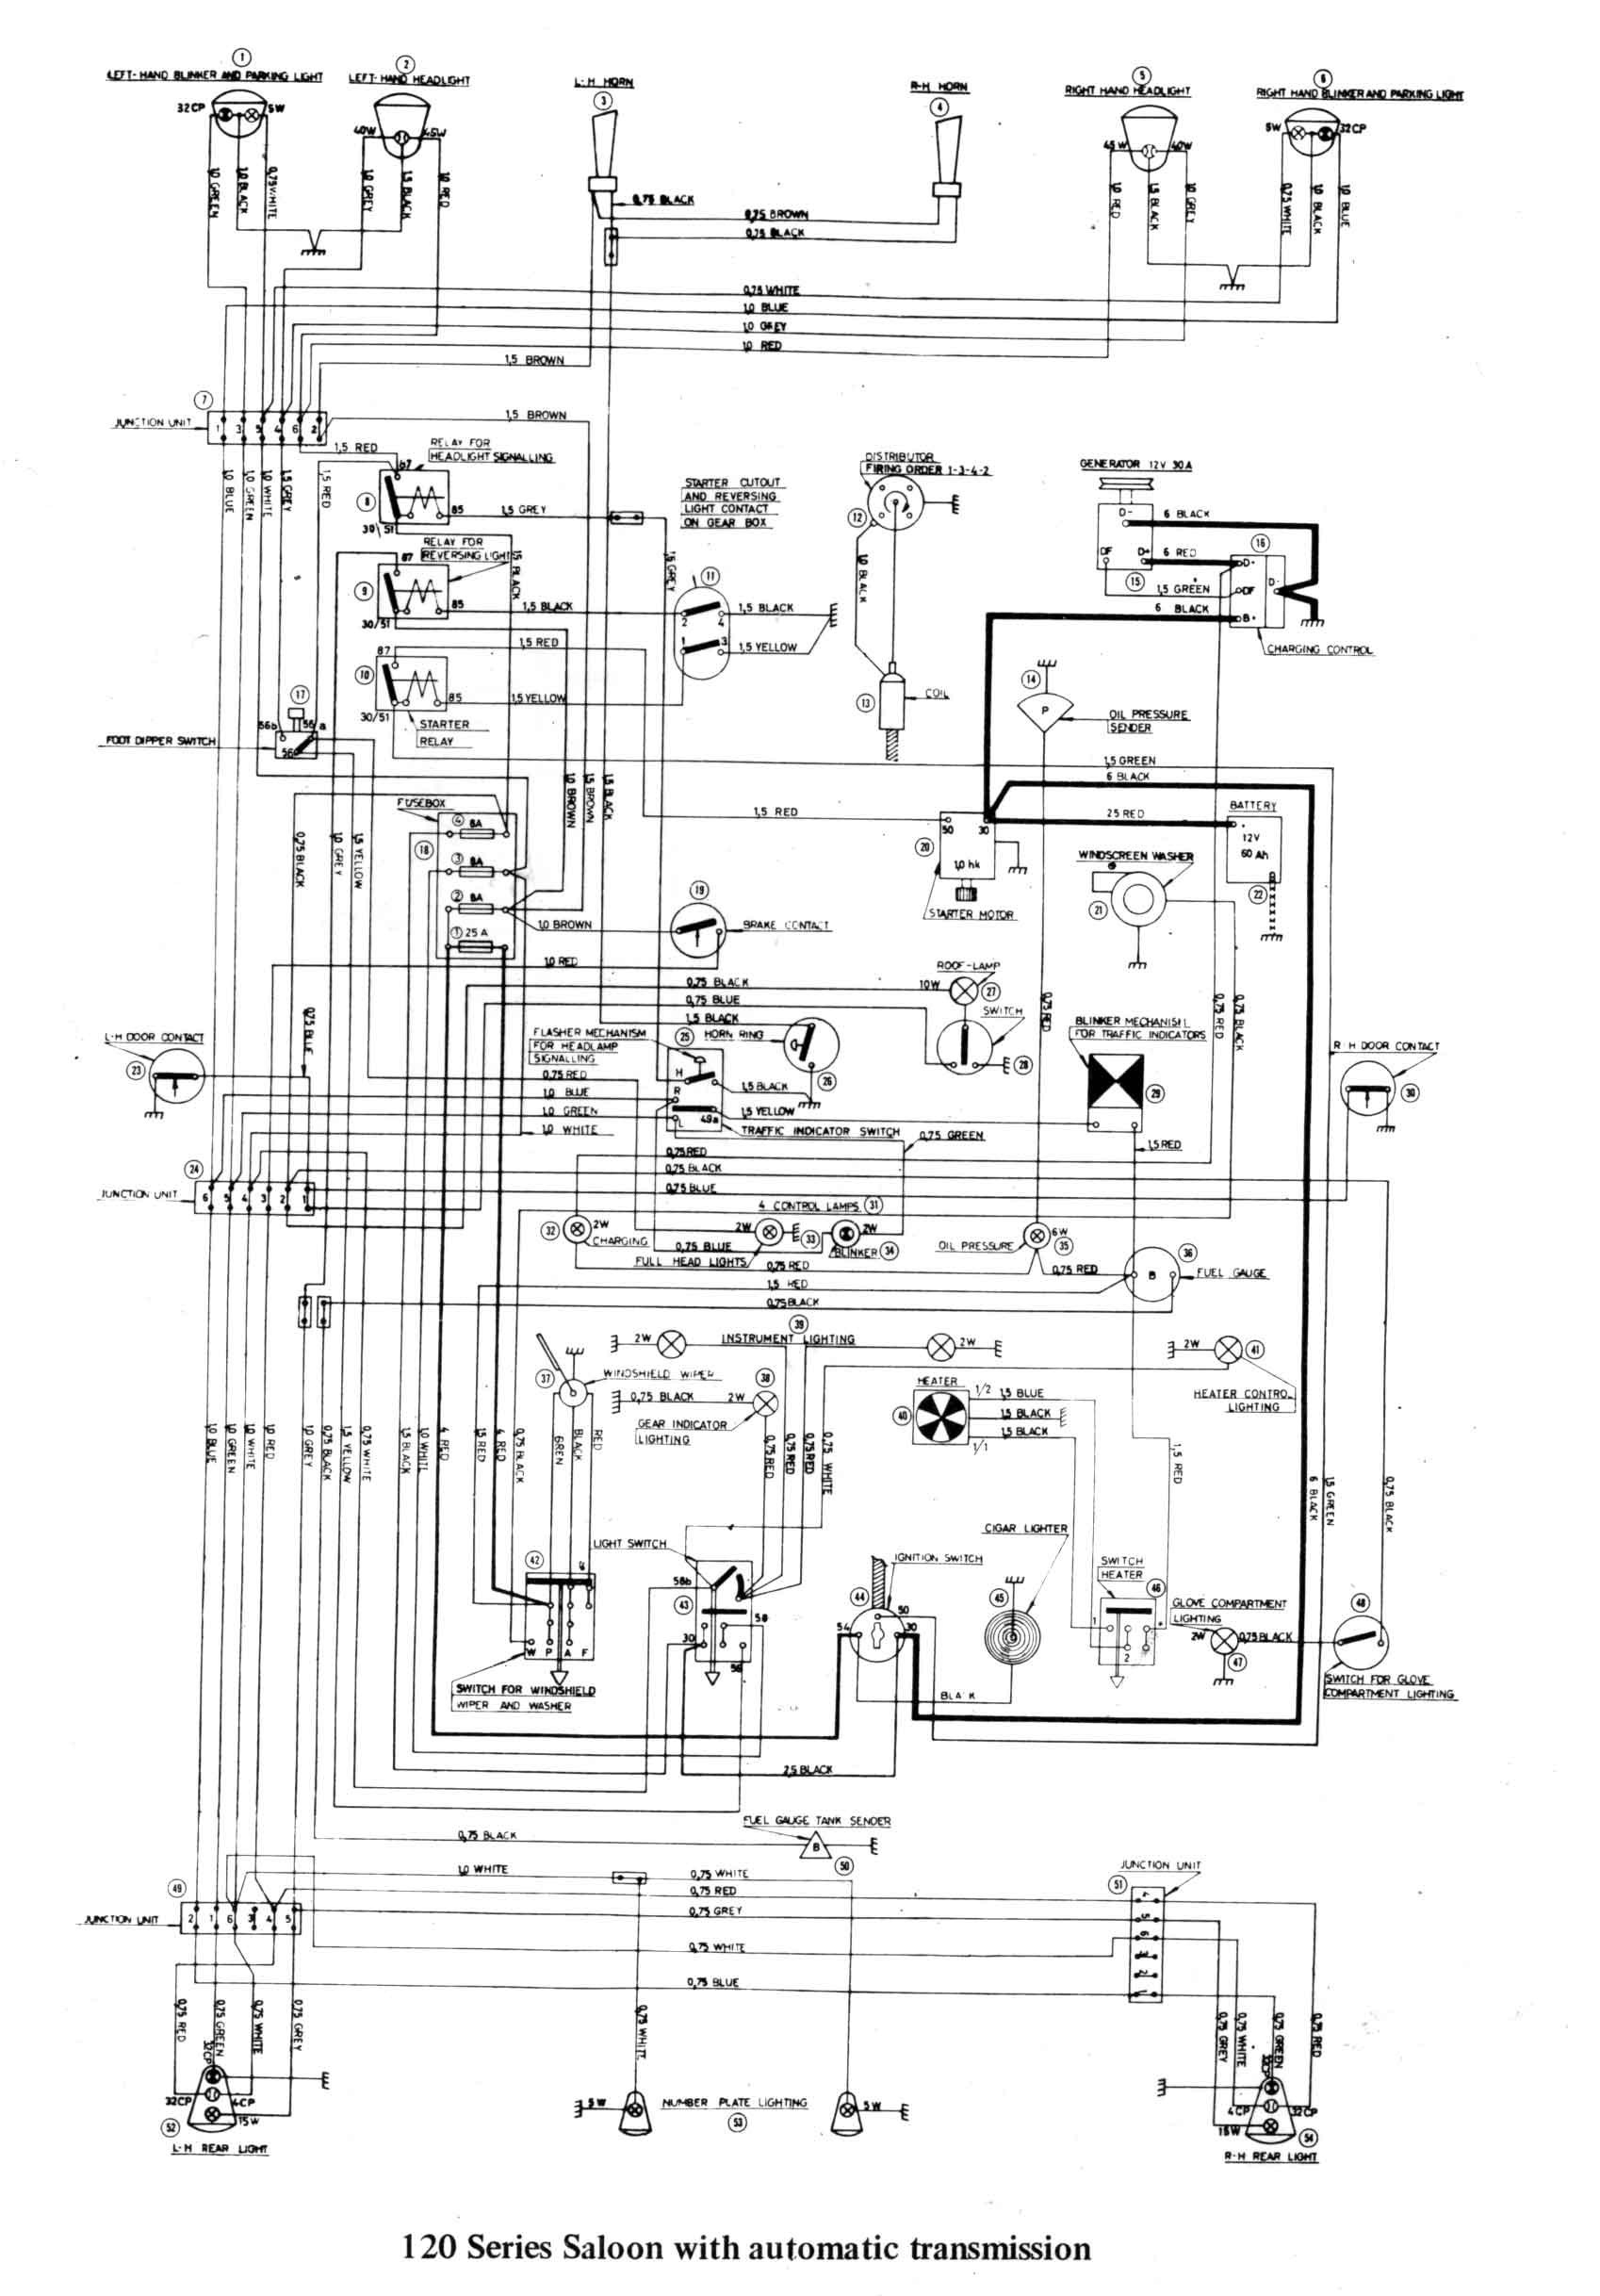 Volvo S80 2000 Wiring Diagram Diagram Download] Wiring Diagram Volvo Xc70 2004 Full Of Volvo S80 2000 Wiring Diagram